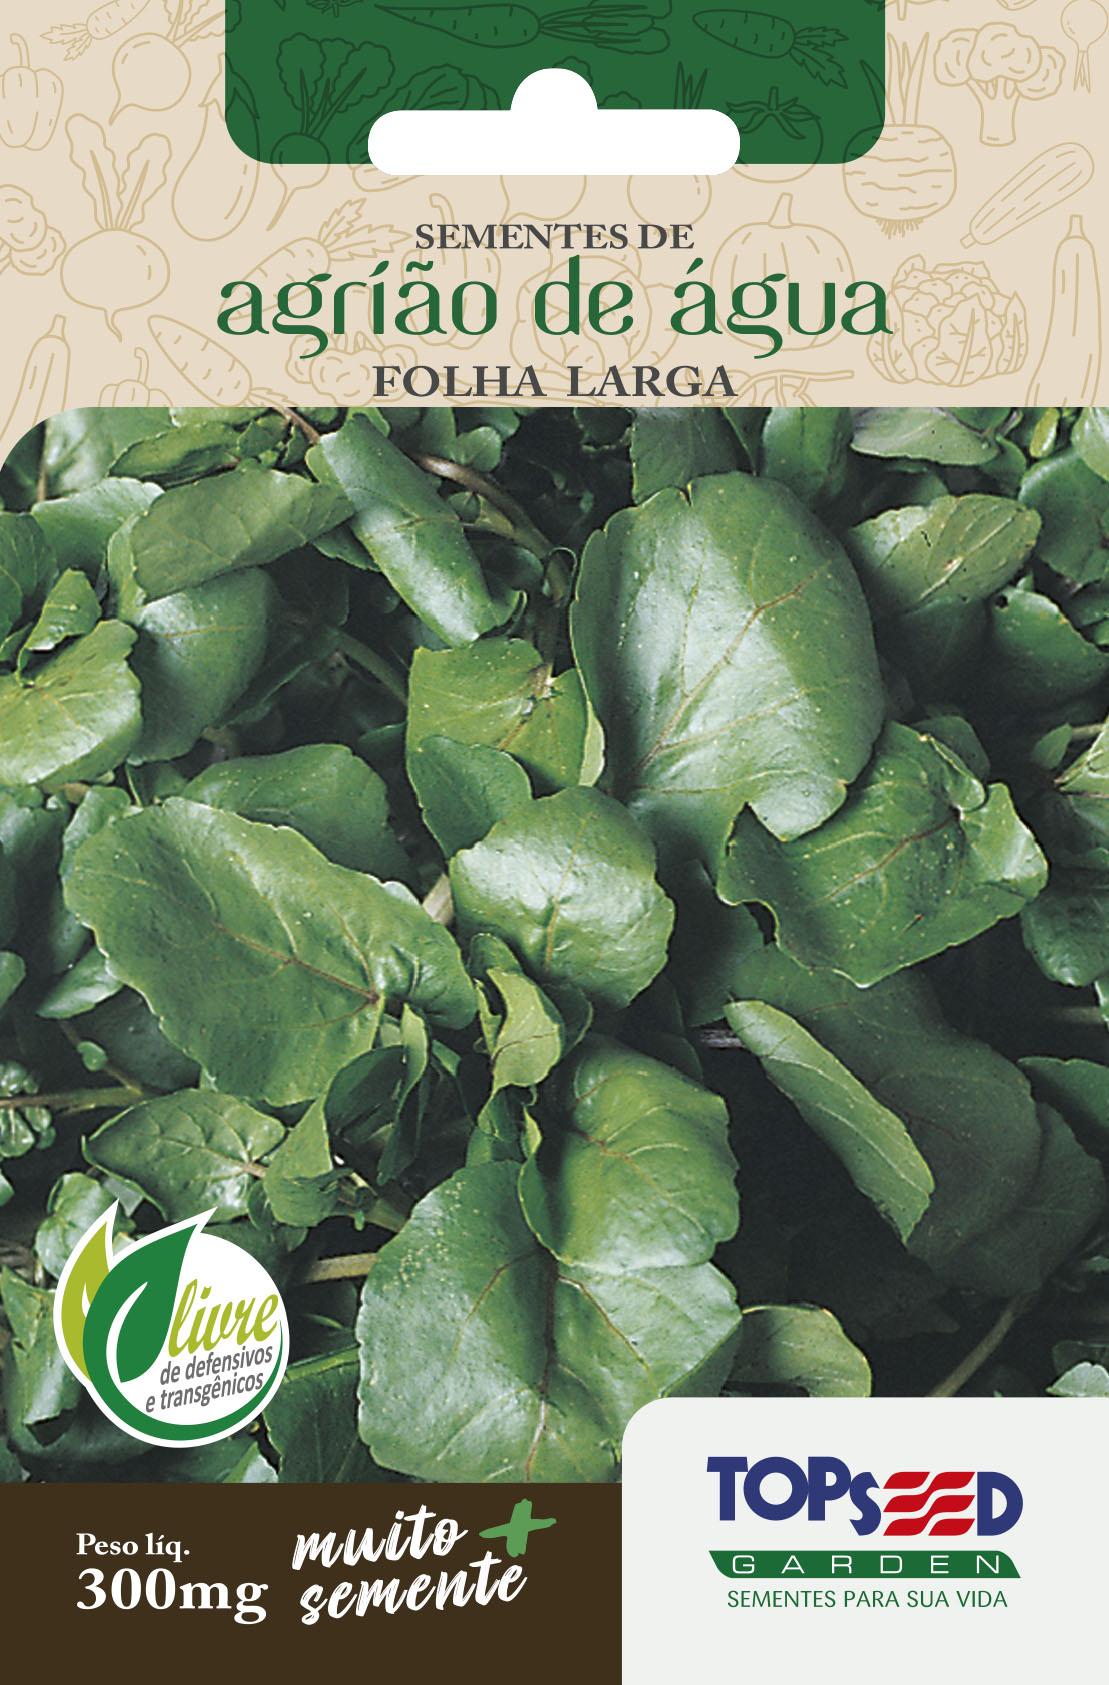 AGRIÃO DE ÁGUA FOLHA LARGA